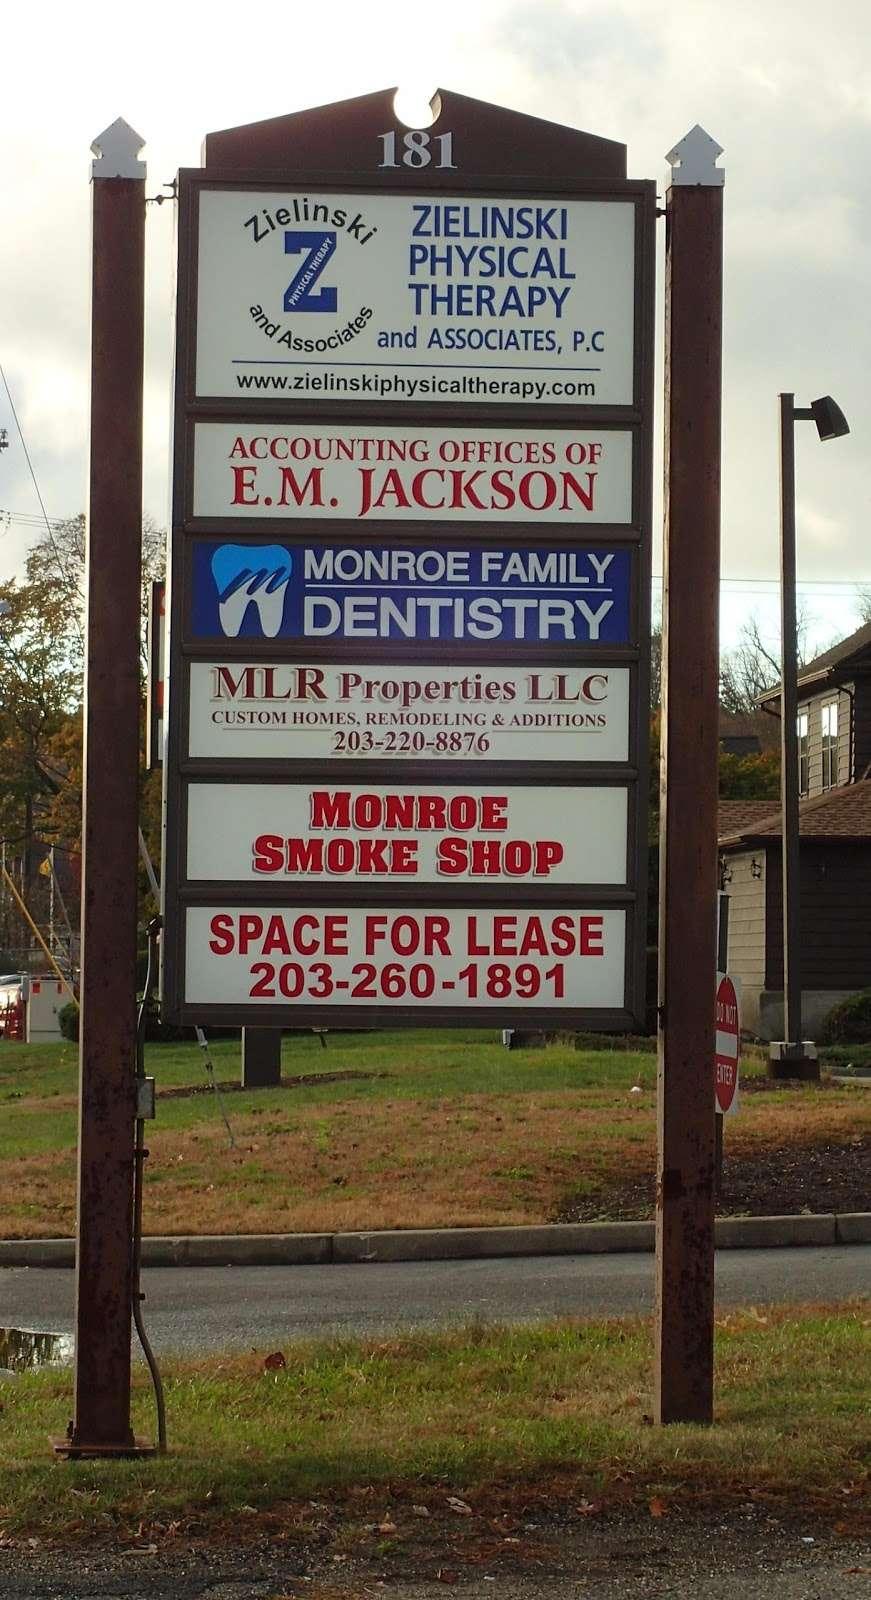 Monroe Family Dentistry - dentist  | Photo 9 of 10 | Address: 181 Main St, Monroe, CT 06468, USA | Phone: (203) 445-8365